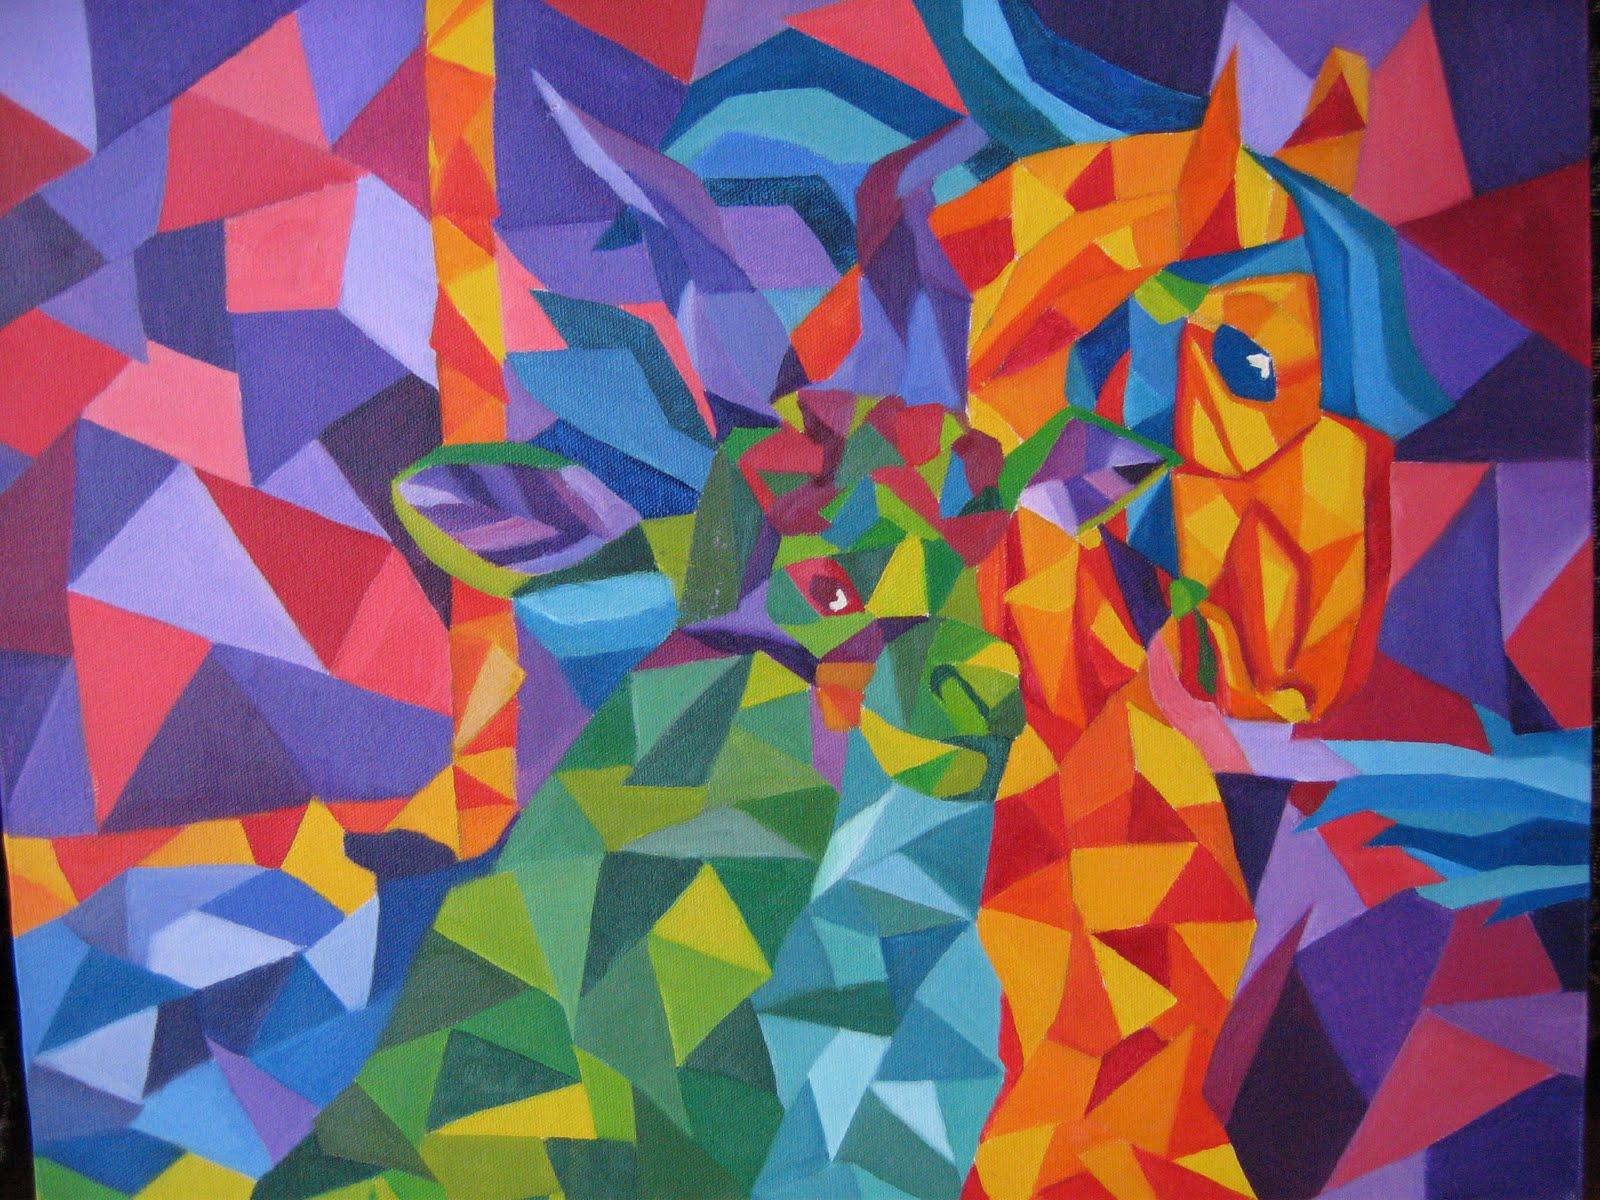 Cubist Art Wallpaper Wallpapersafari HD Wallpapers Download Free Images Wallpaper [1000image.com]